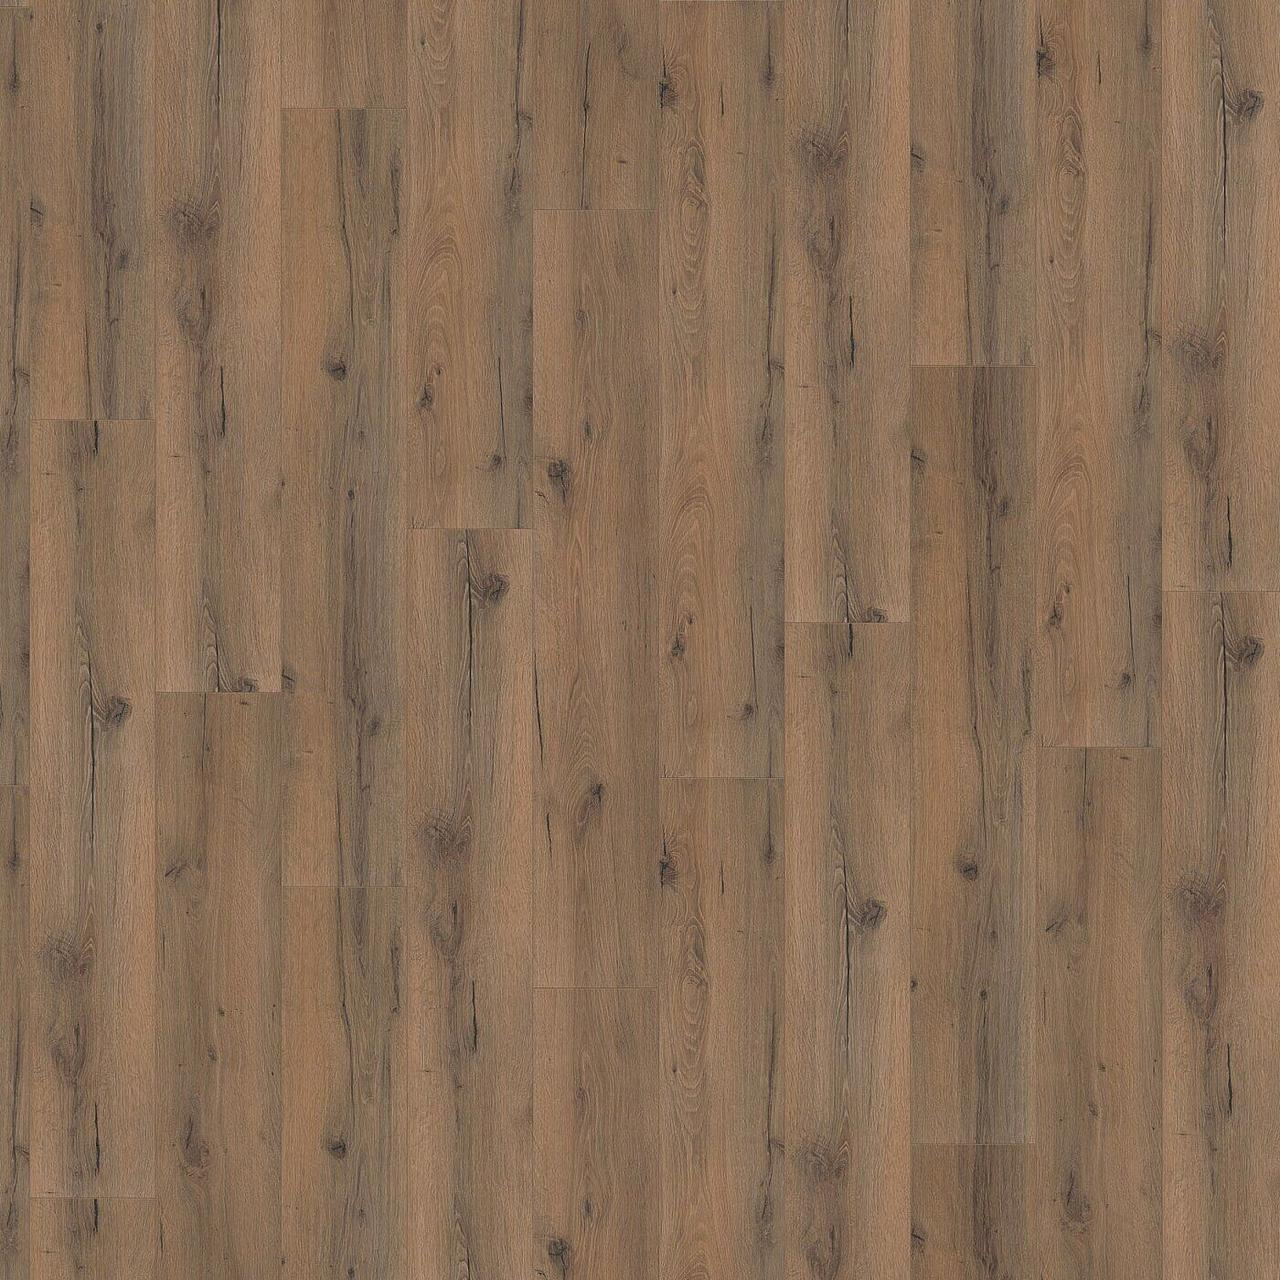 Ламинат WINEO Дуб рустик темно-коричневый